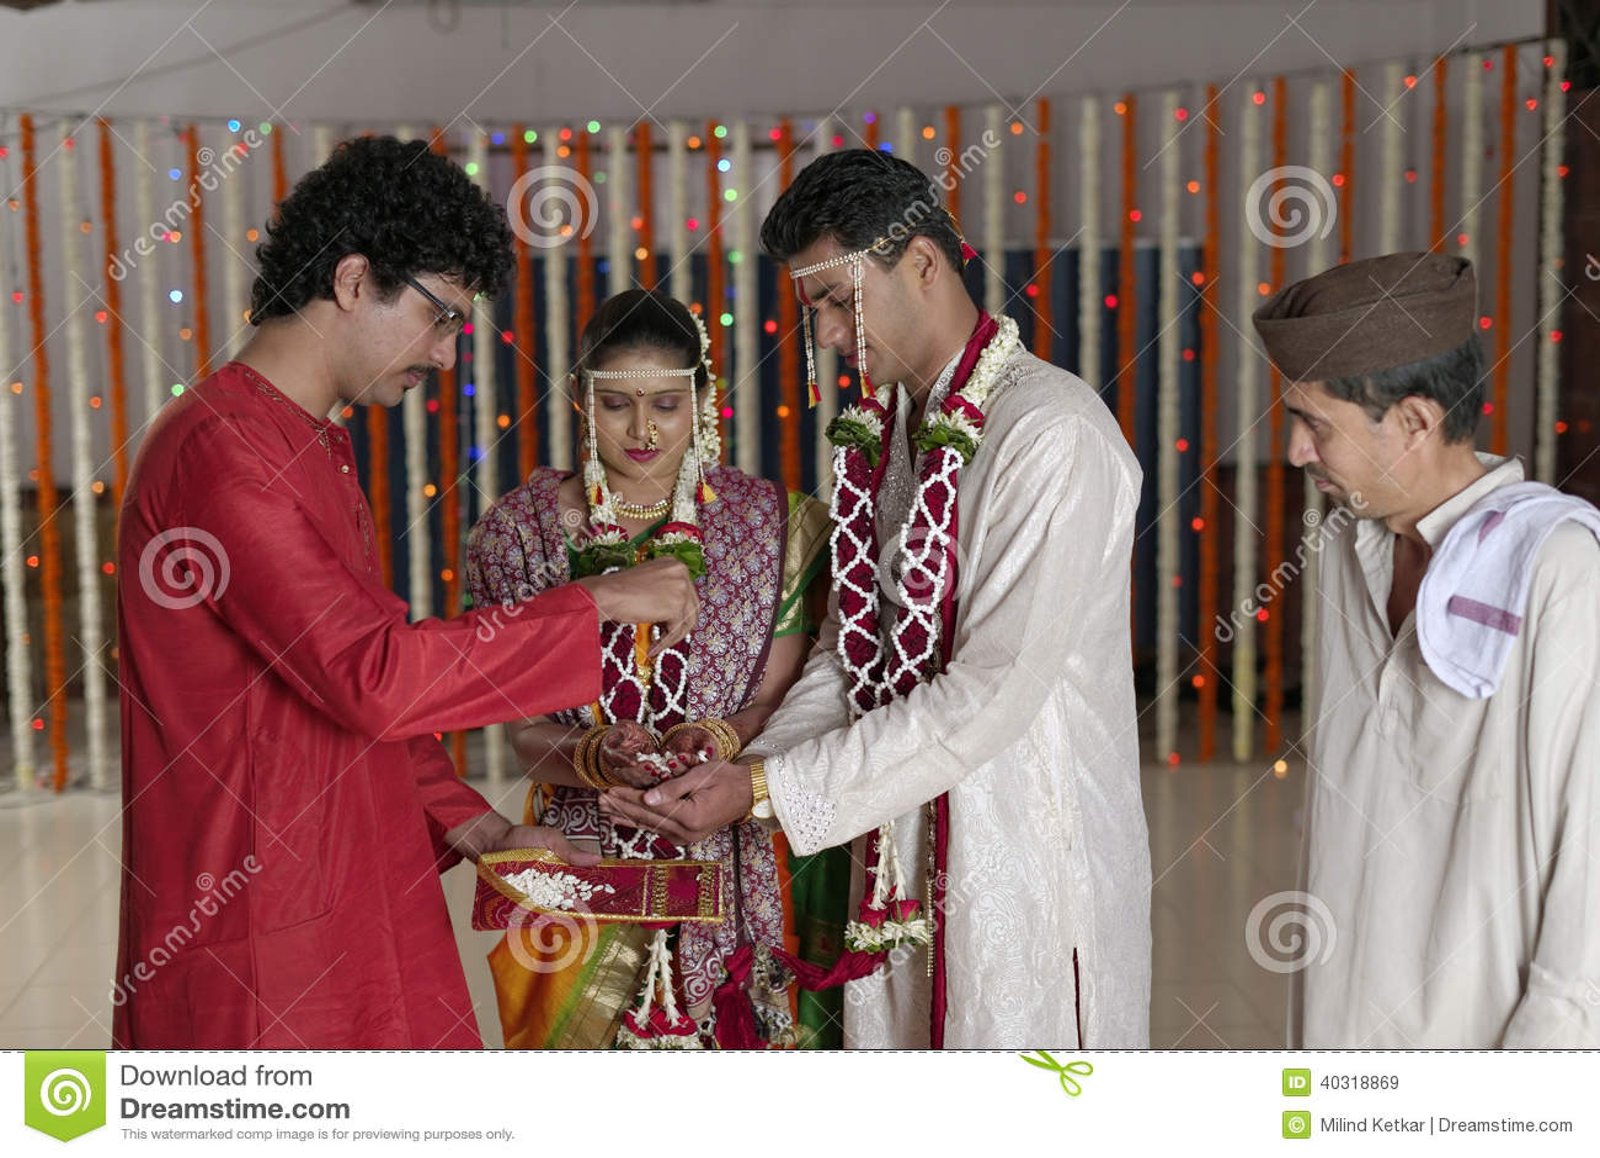 Ritualer i indiskt hinduiskt bröllop